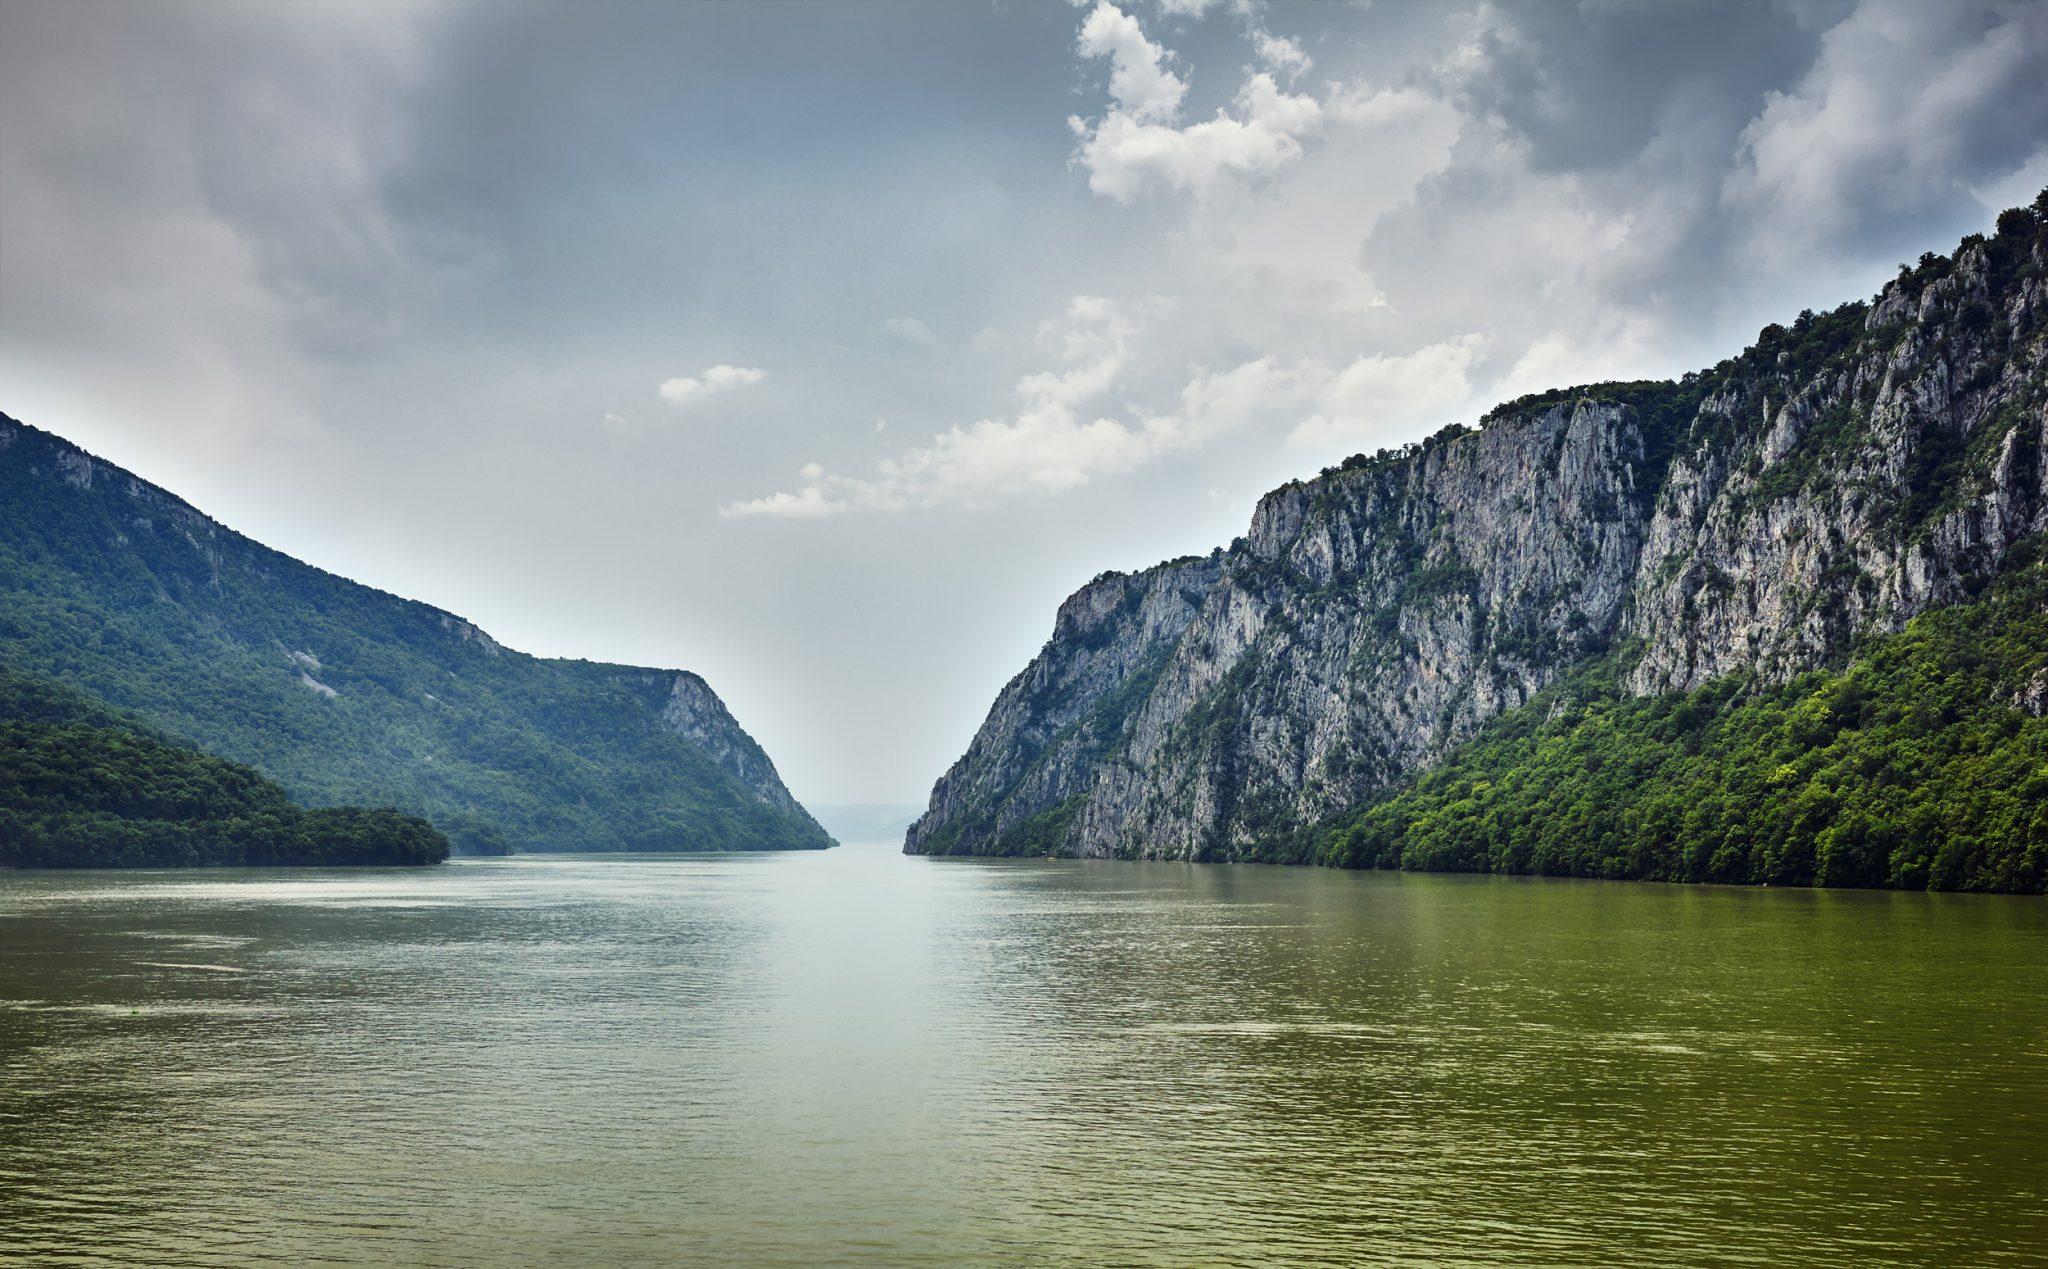 Amawaterways Grand Danube Cruise Danube River Cruise